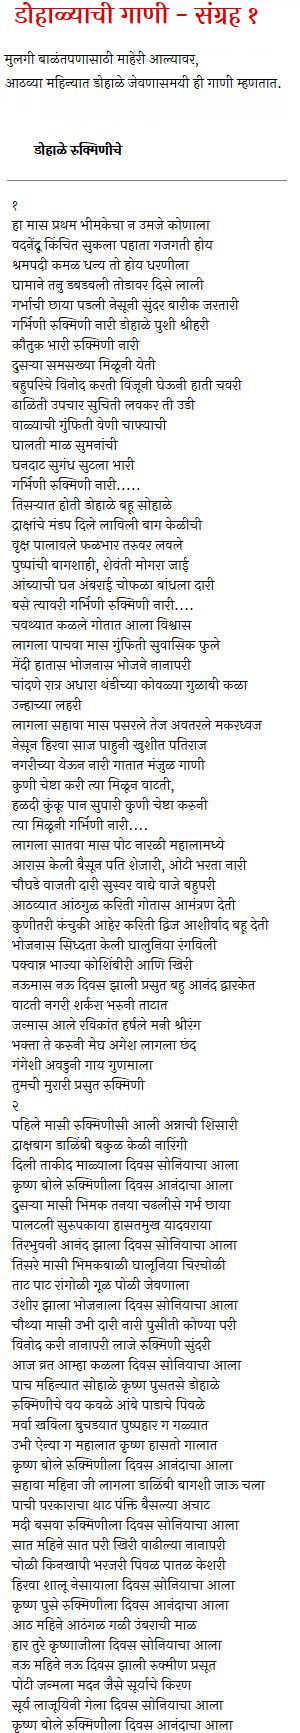 Marathi Dohale Jevan Geet